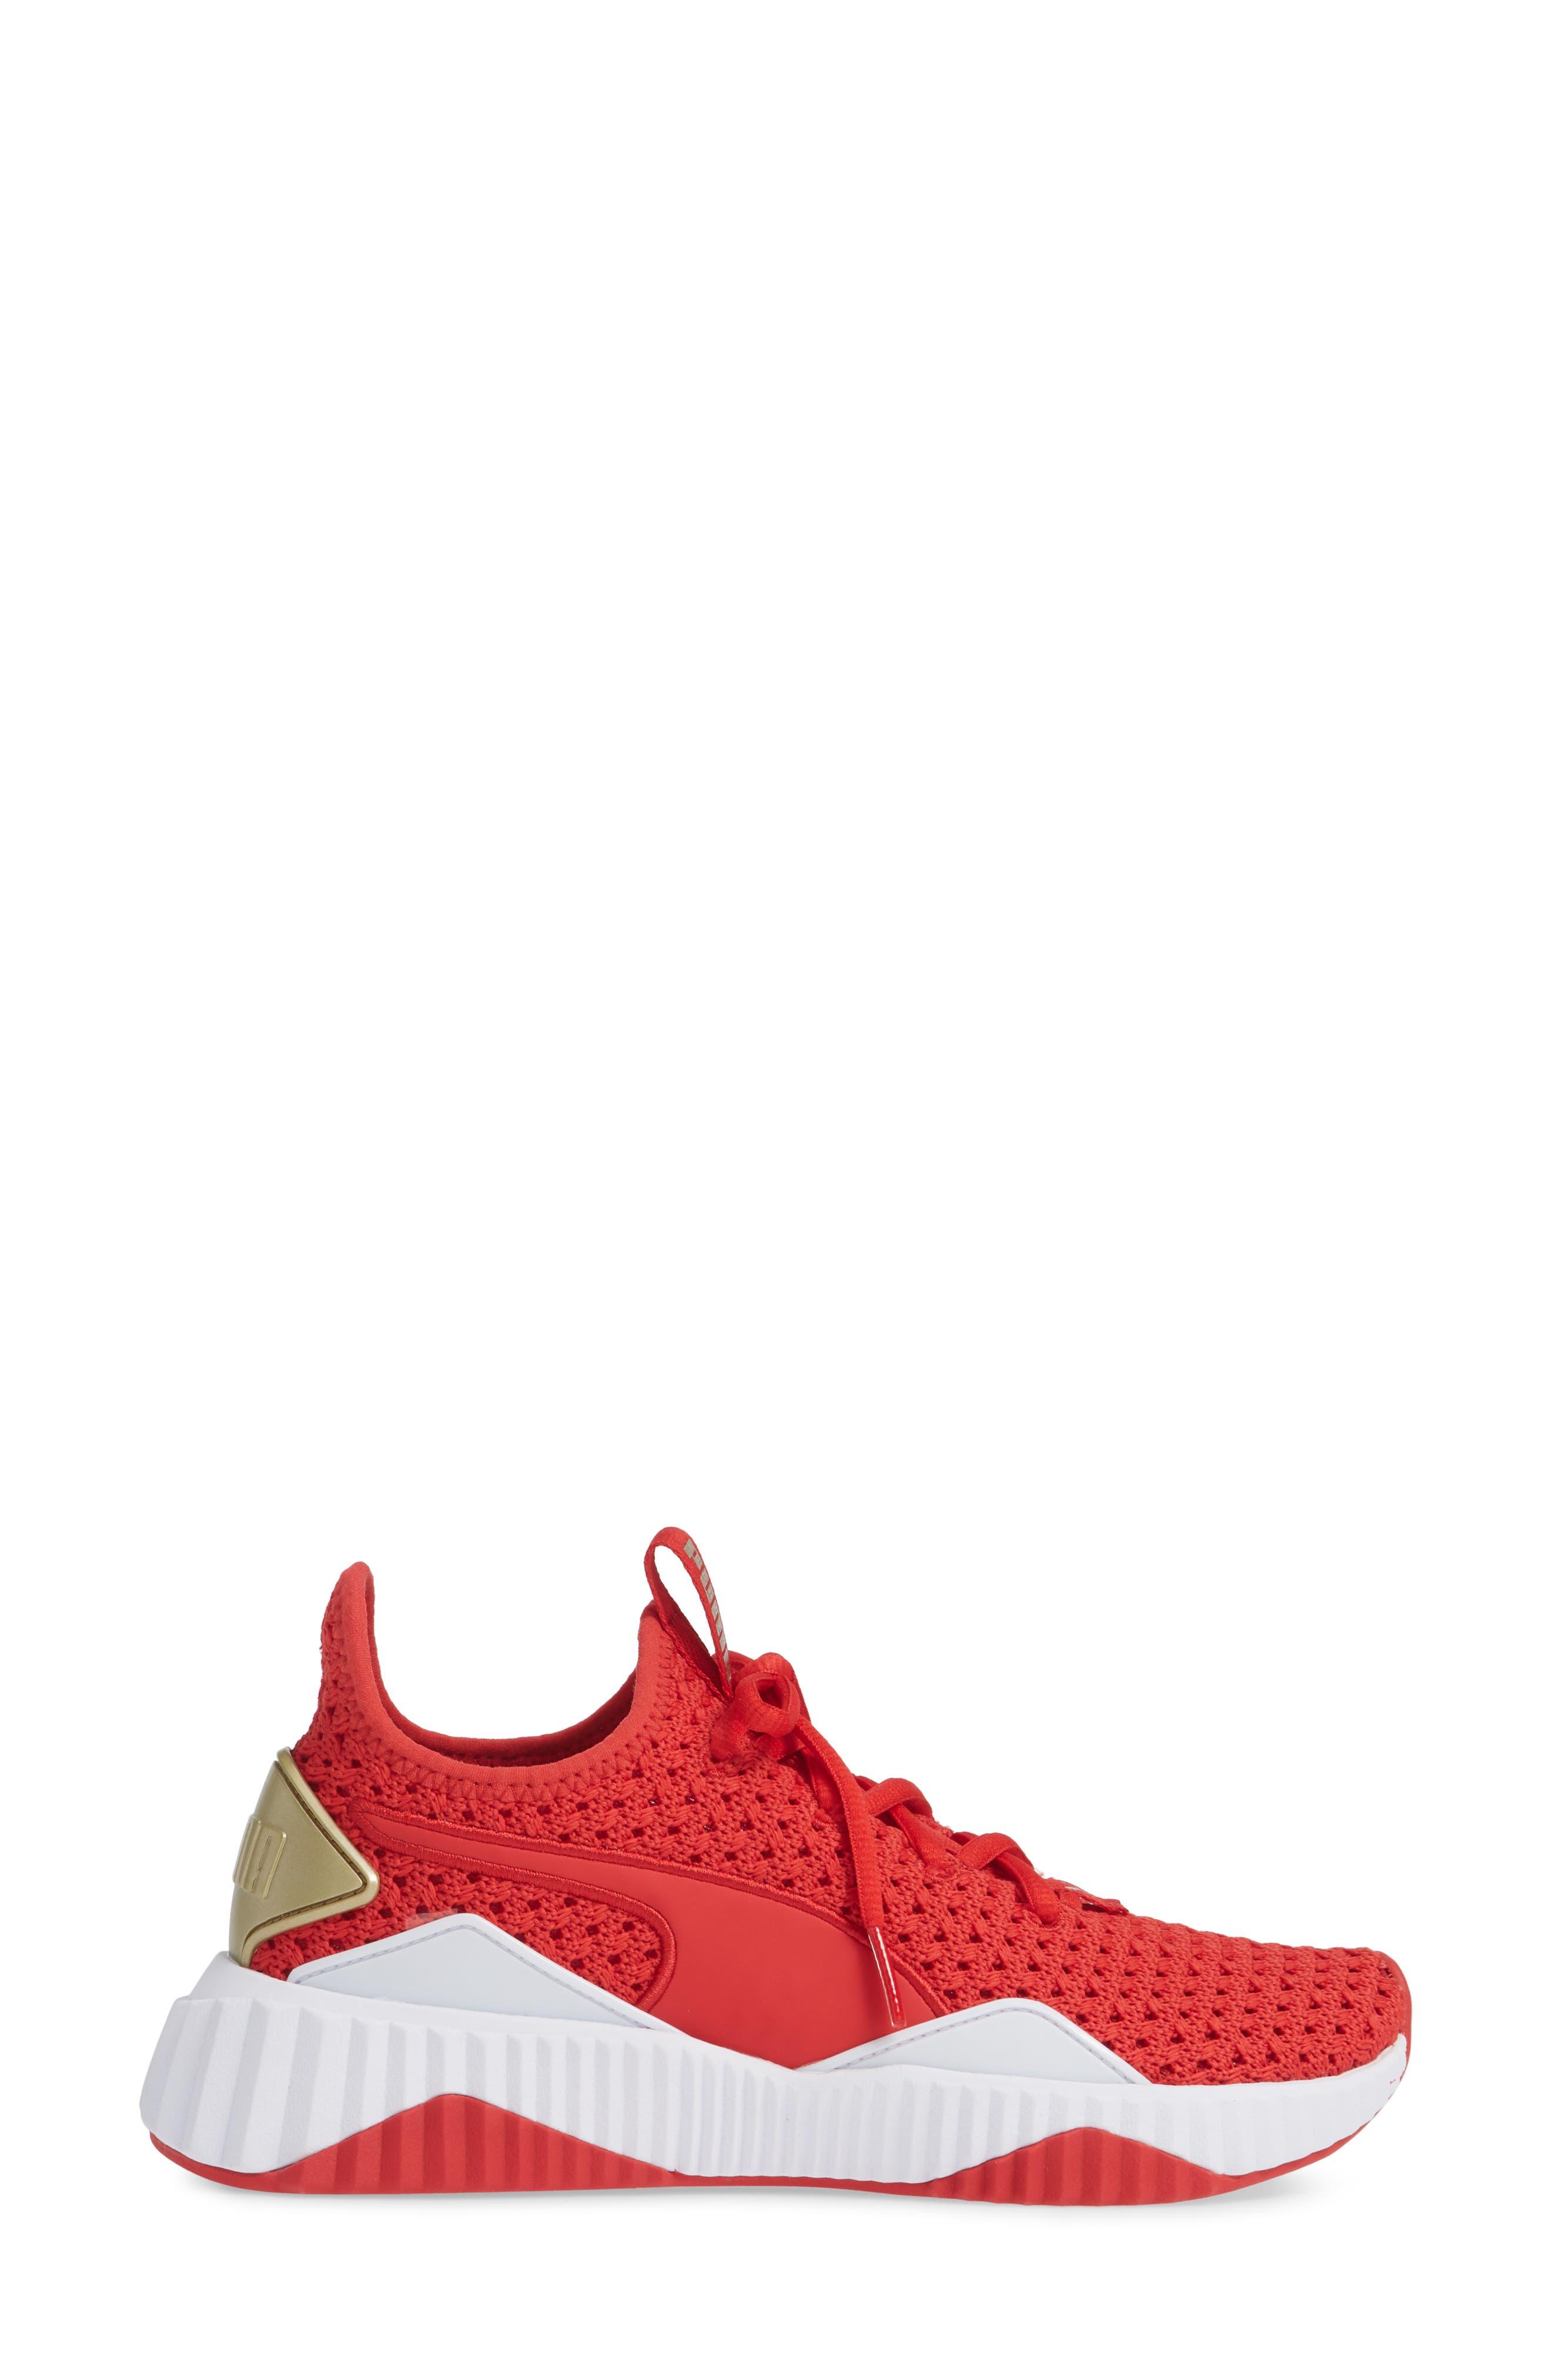 Defy Varsity Sneaker,                             Alternate thumbnail 3, color,                             RIBBON RED/ METALLIC GOLD